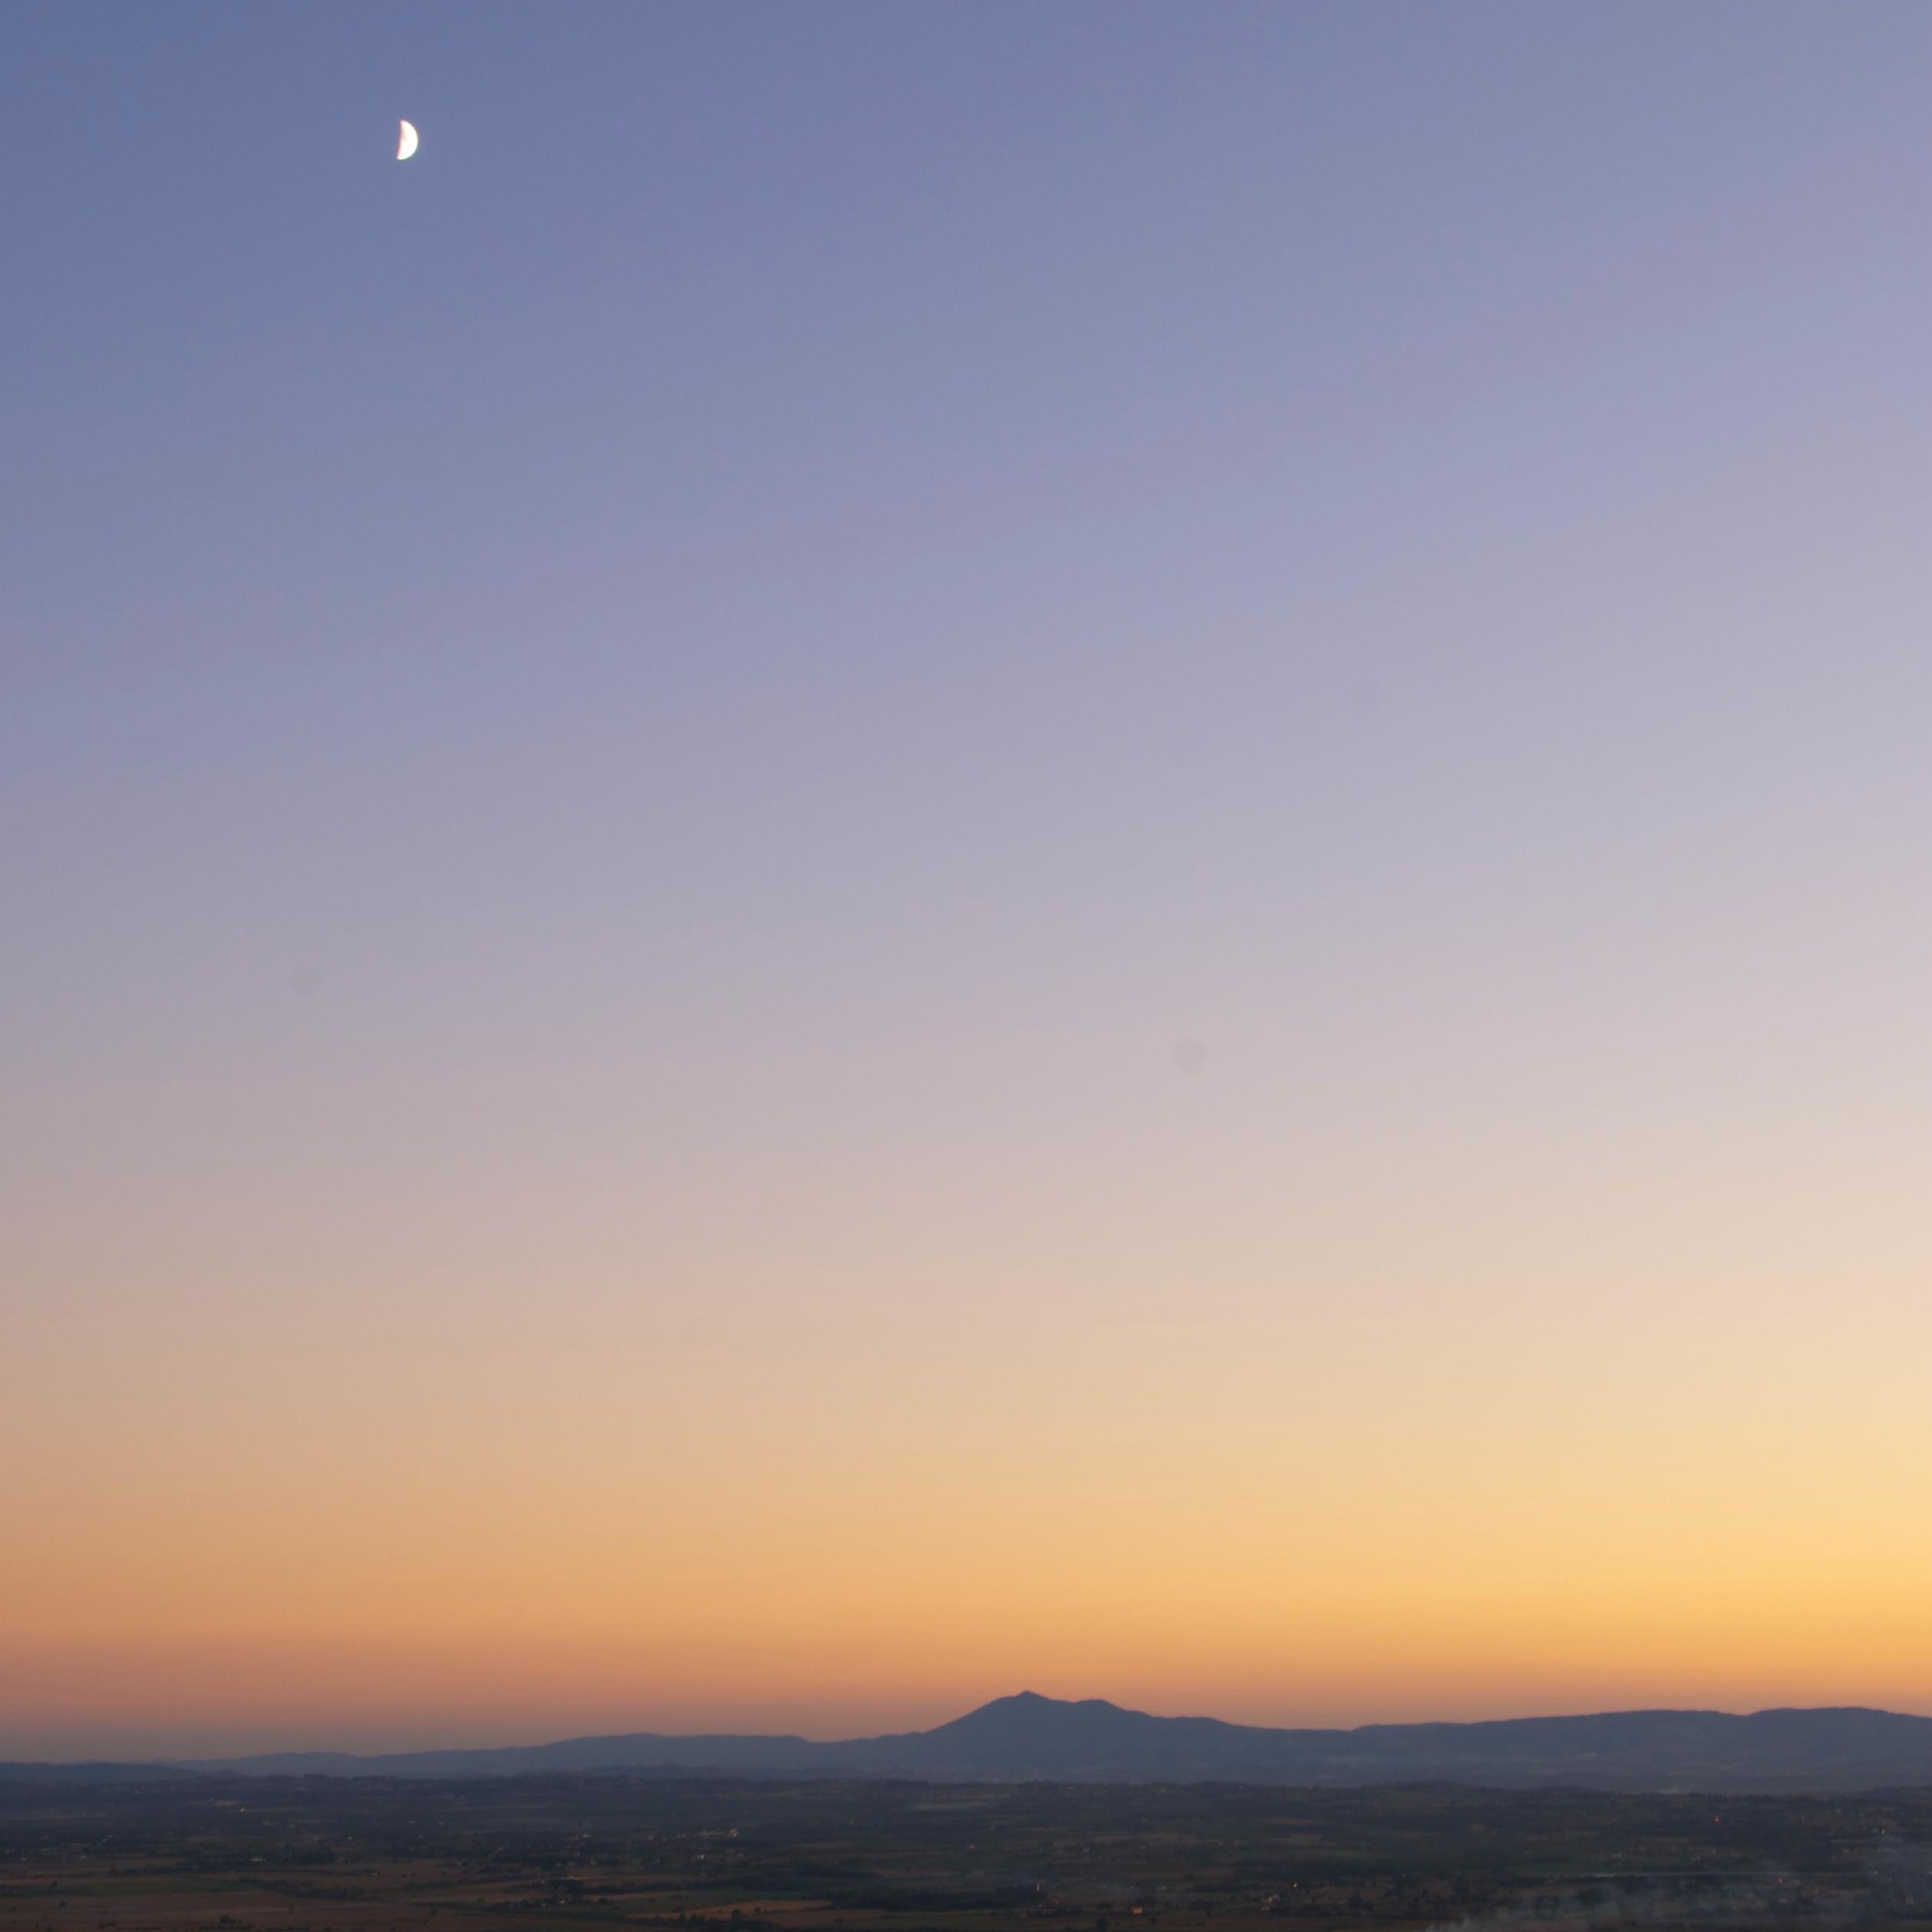 Moonrise Over Monte Amiata